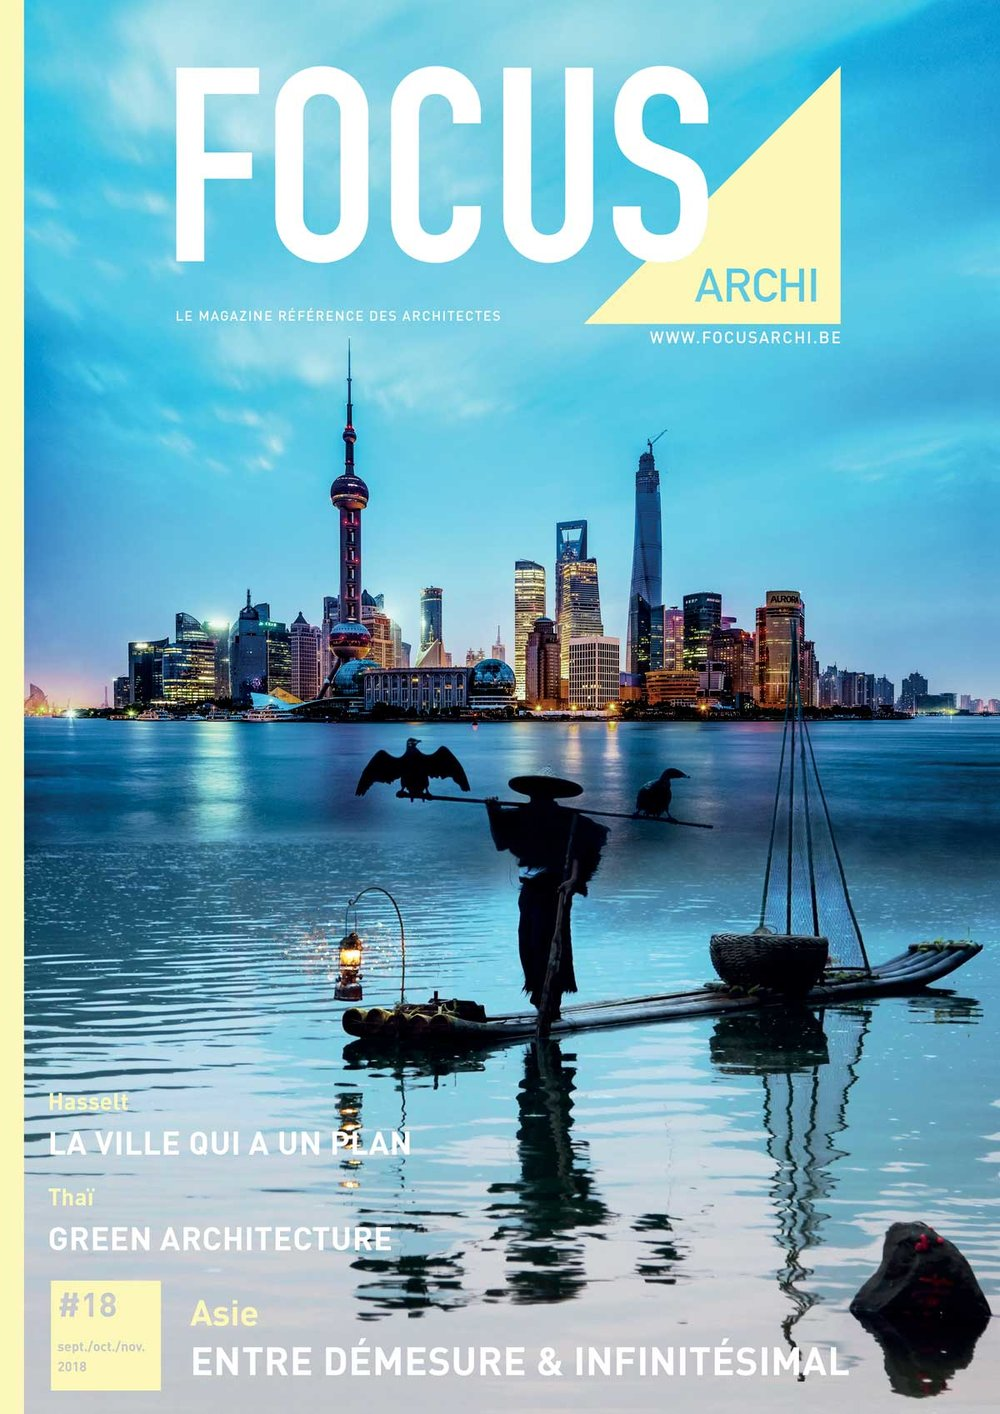 Focus-archi-magazine-18-septembre-octobre-novembre-2018.jpg